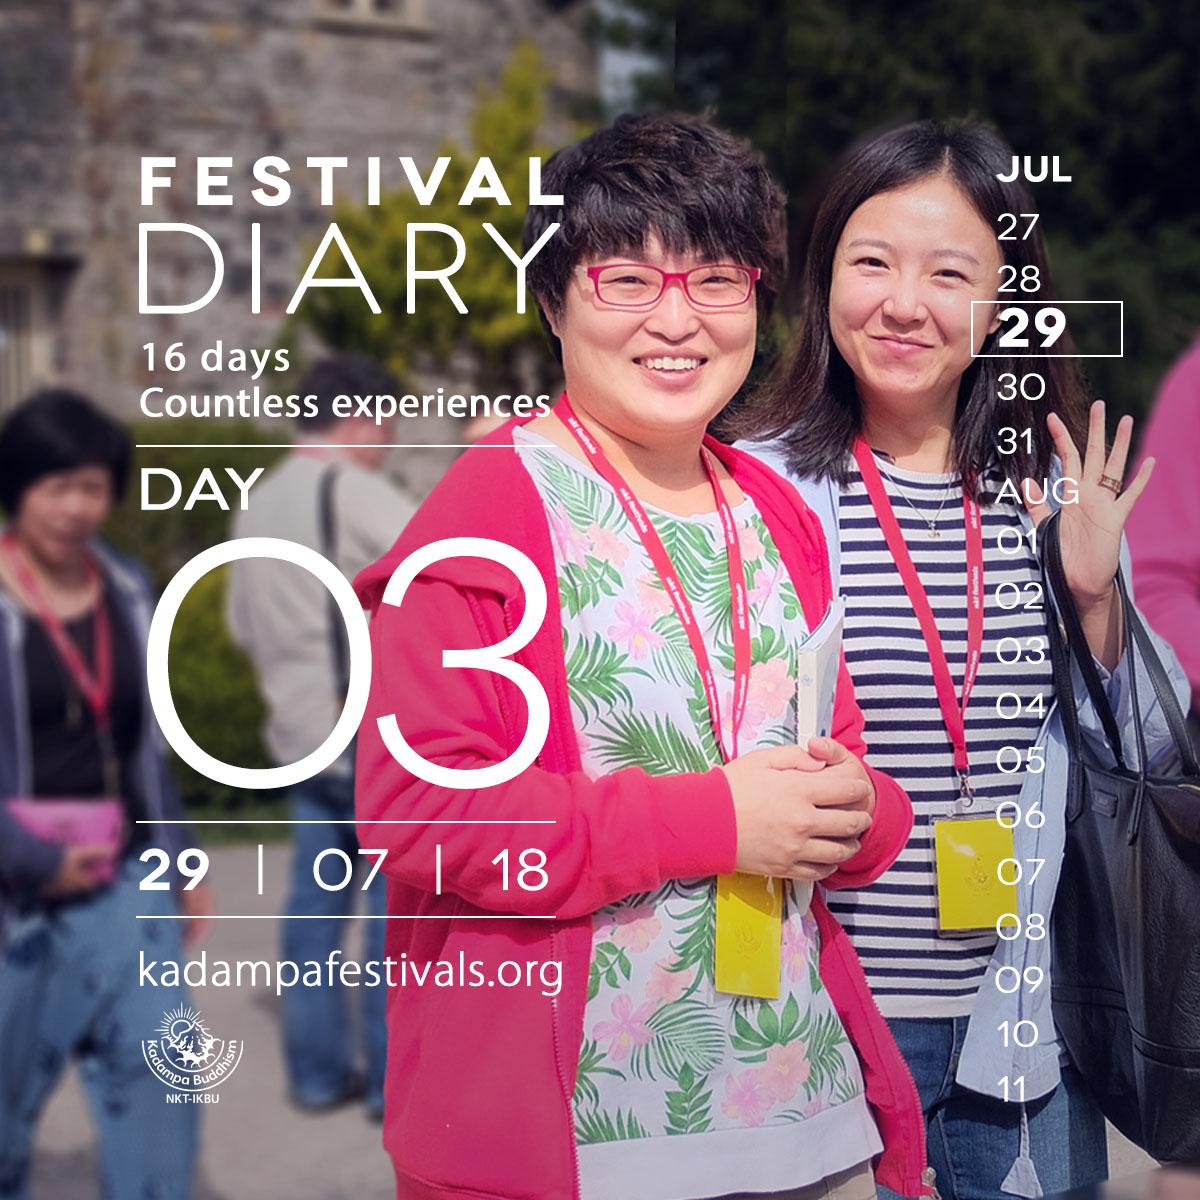 2018-07-26-festival diary-03-m (1)